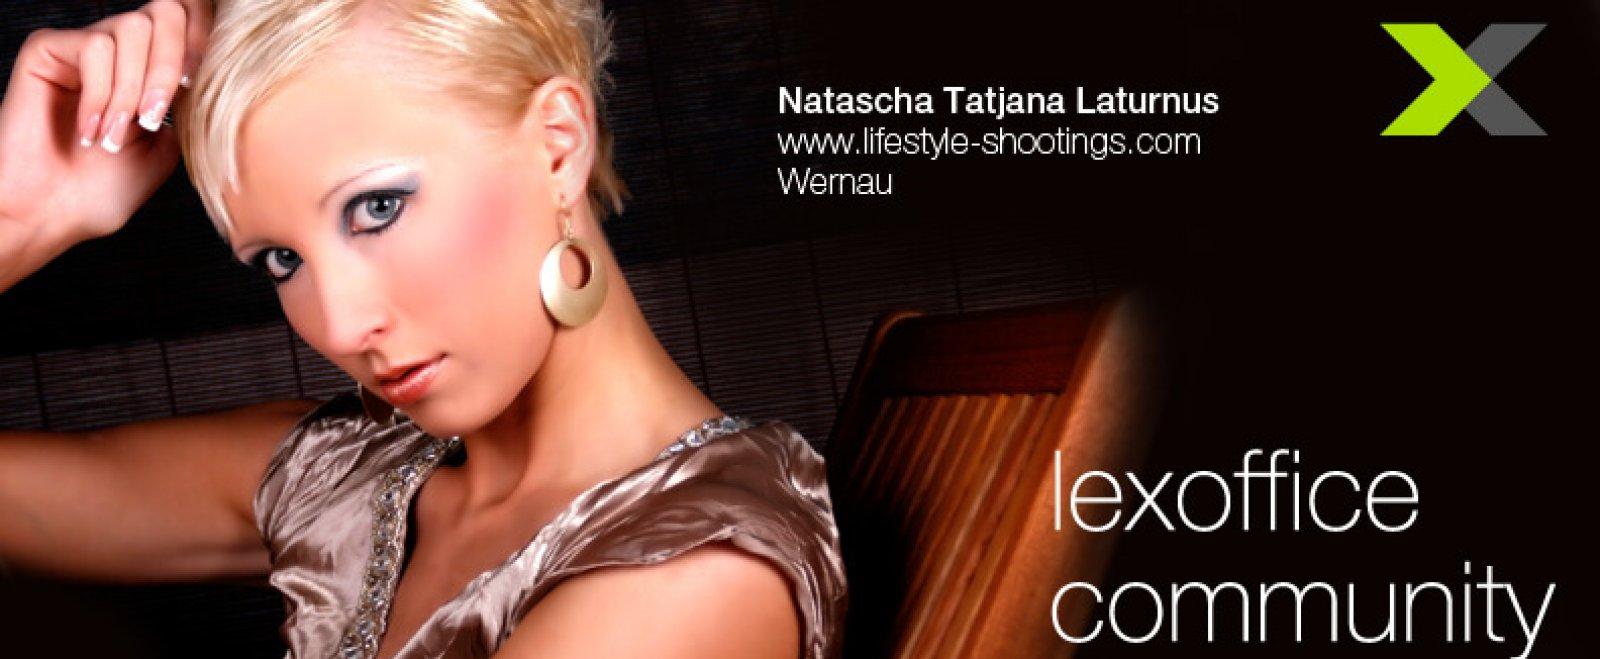 lexoffice Community: User-Interview Natascha Tatjana Laturnus